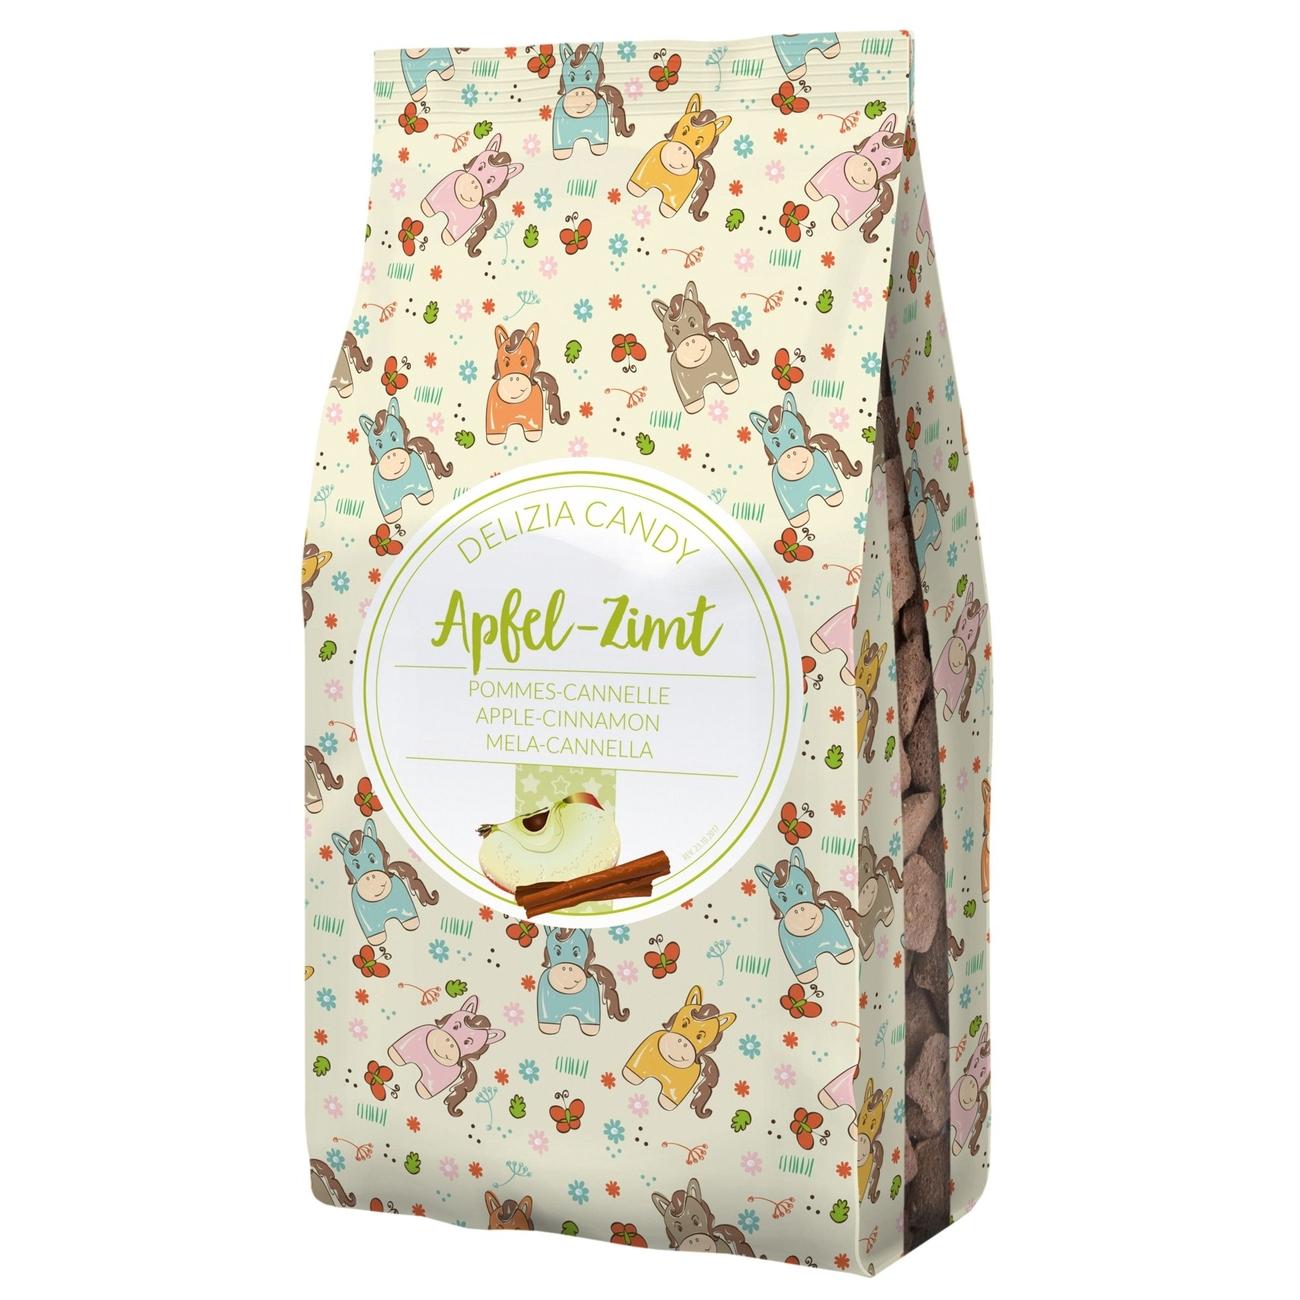 Kerbl Delizia Candy Leckerlie für Pferde, Apfel/Zimt